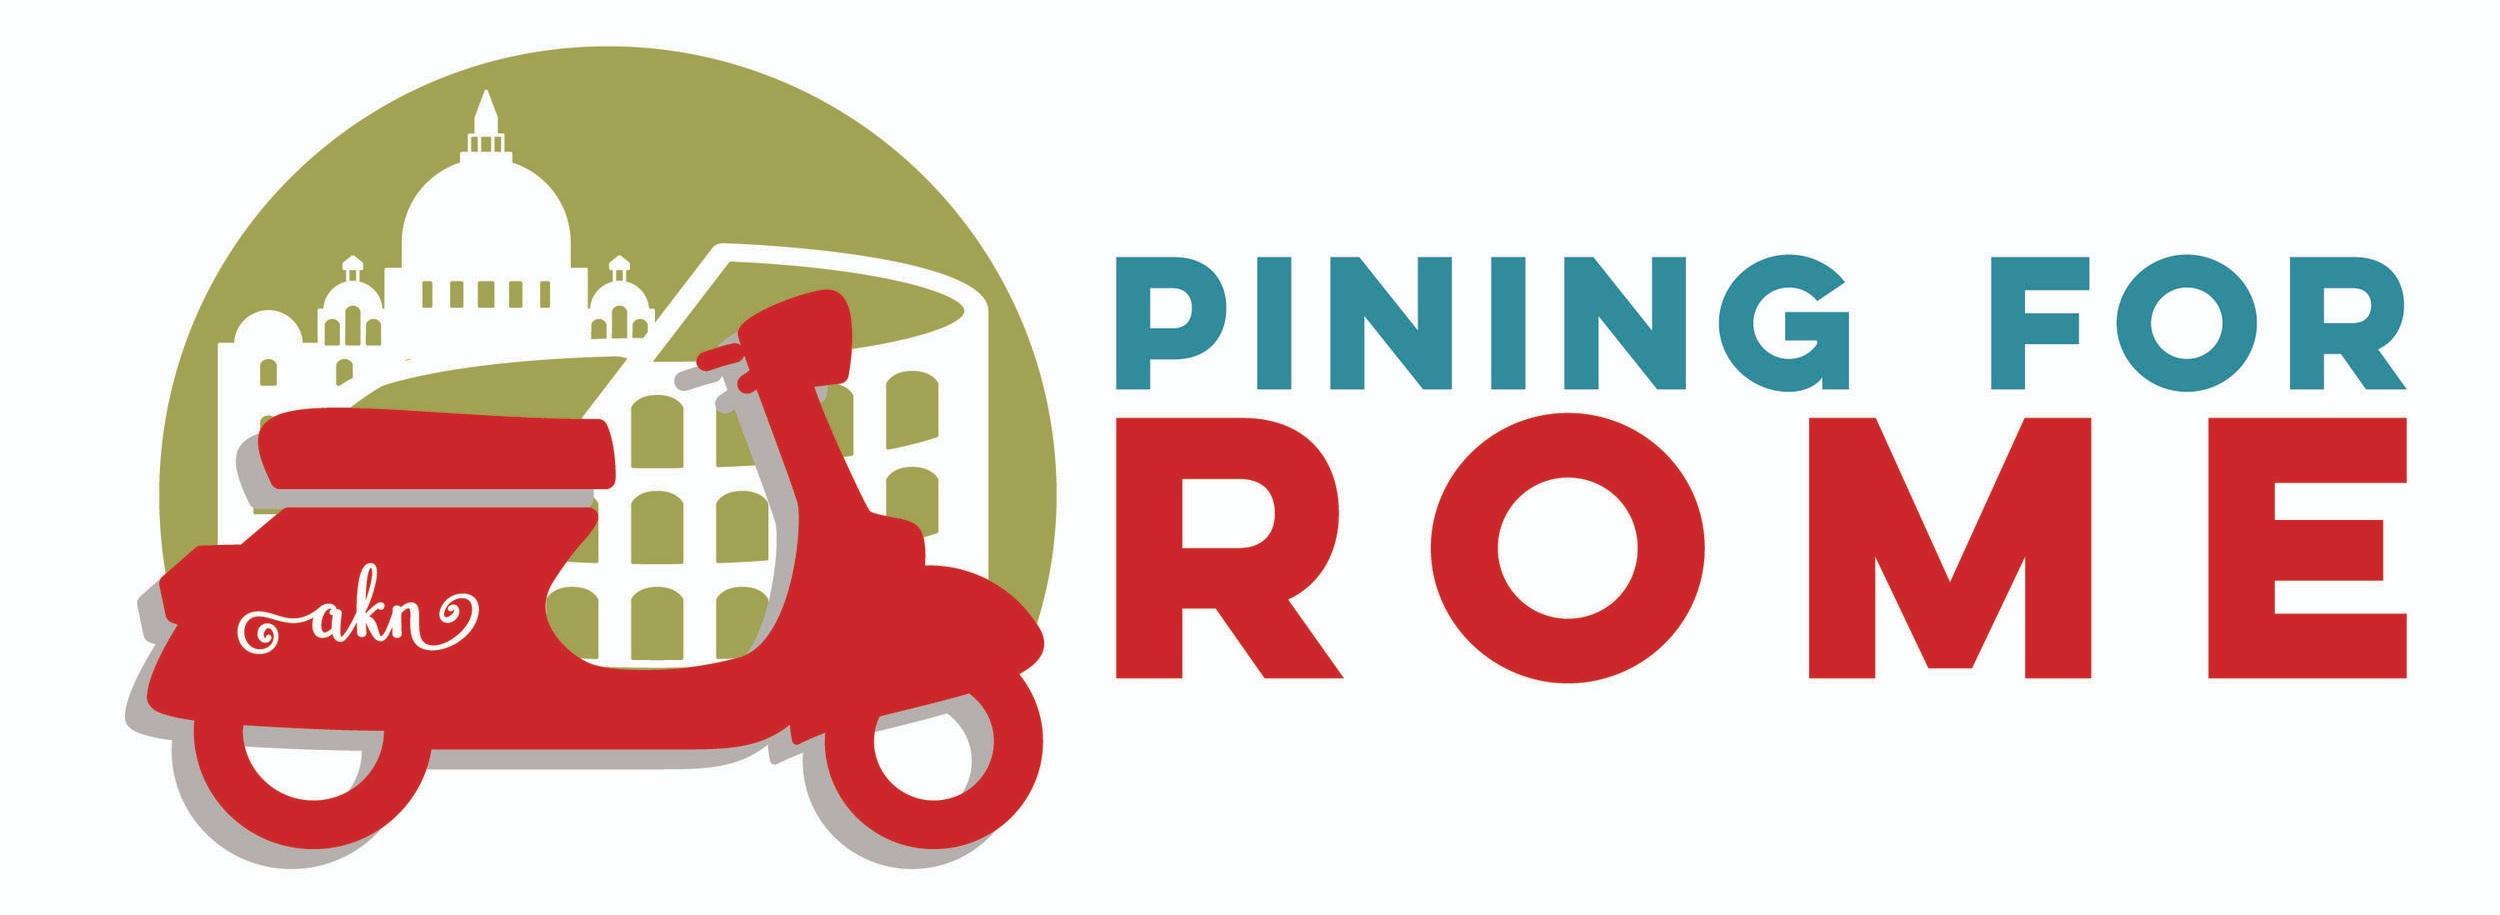 pining+for+rome_final2.jpg